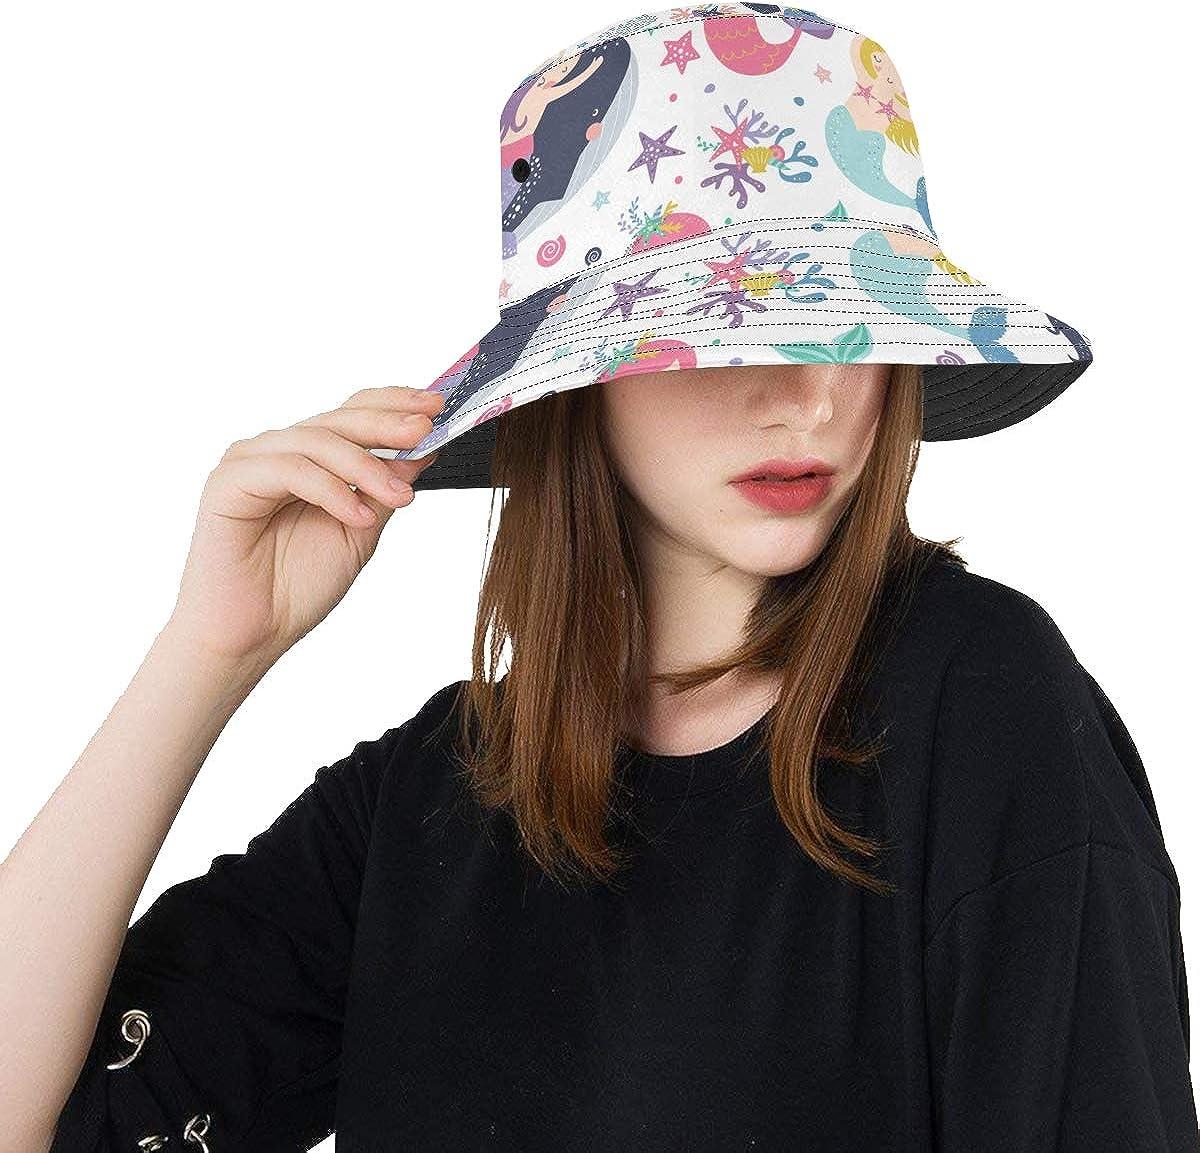 Boy Sun 4 years warranty Hat Mermaid Princess Beauty Unisex S Summer Fishing Today's only Girl